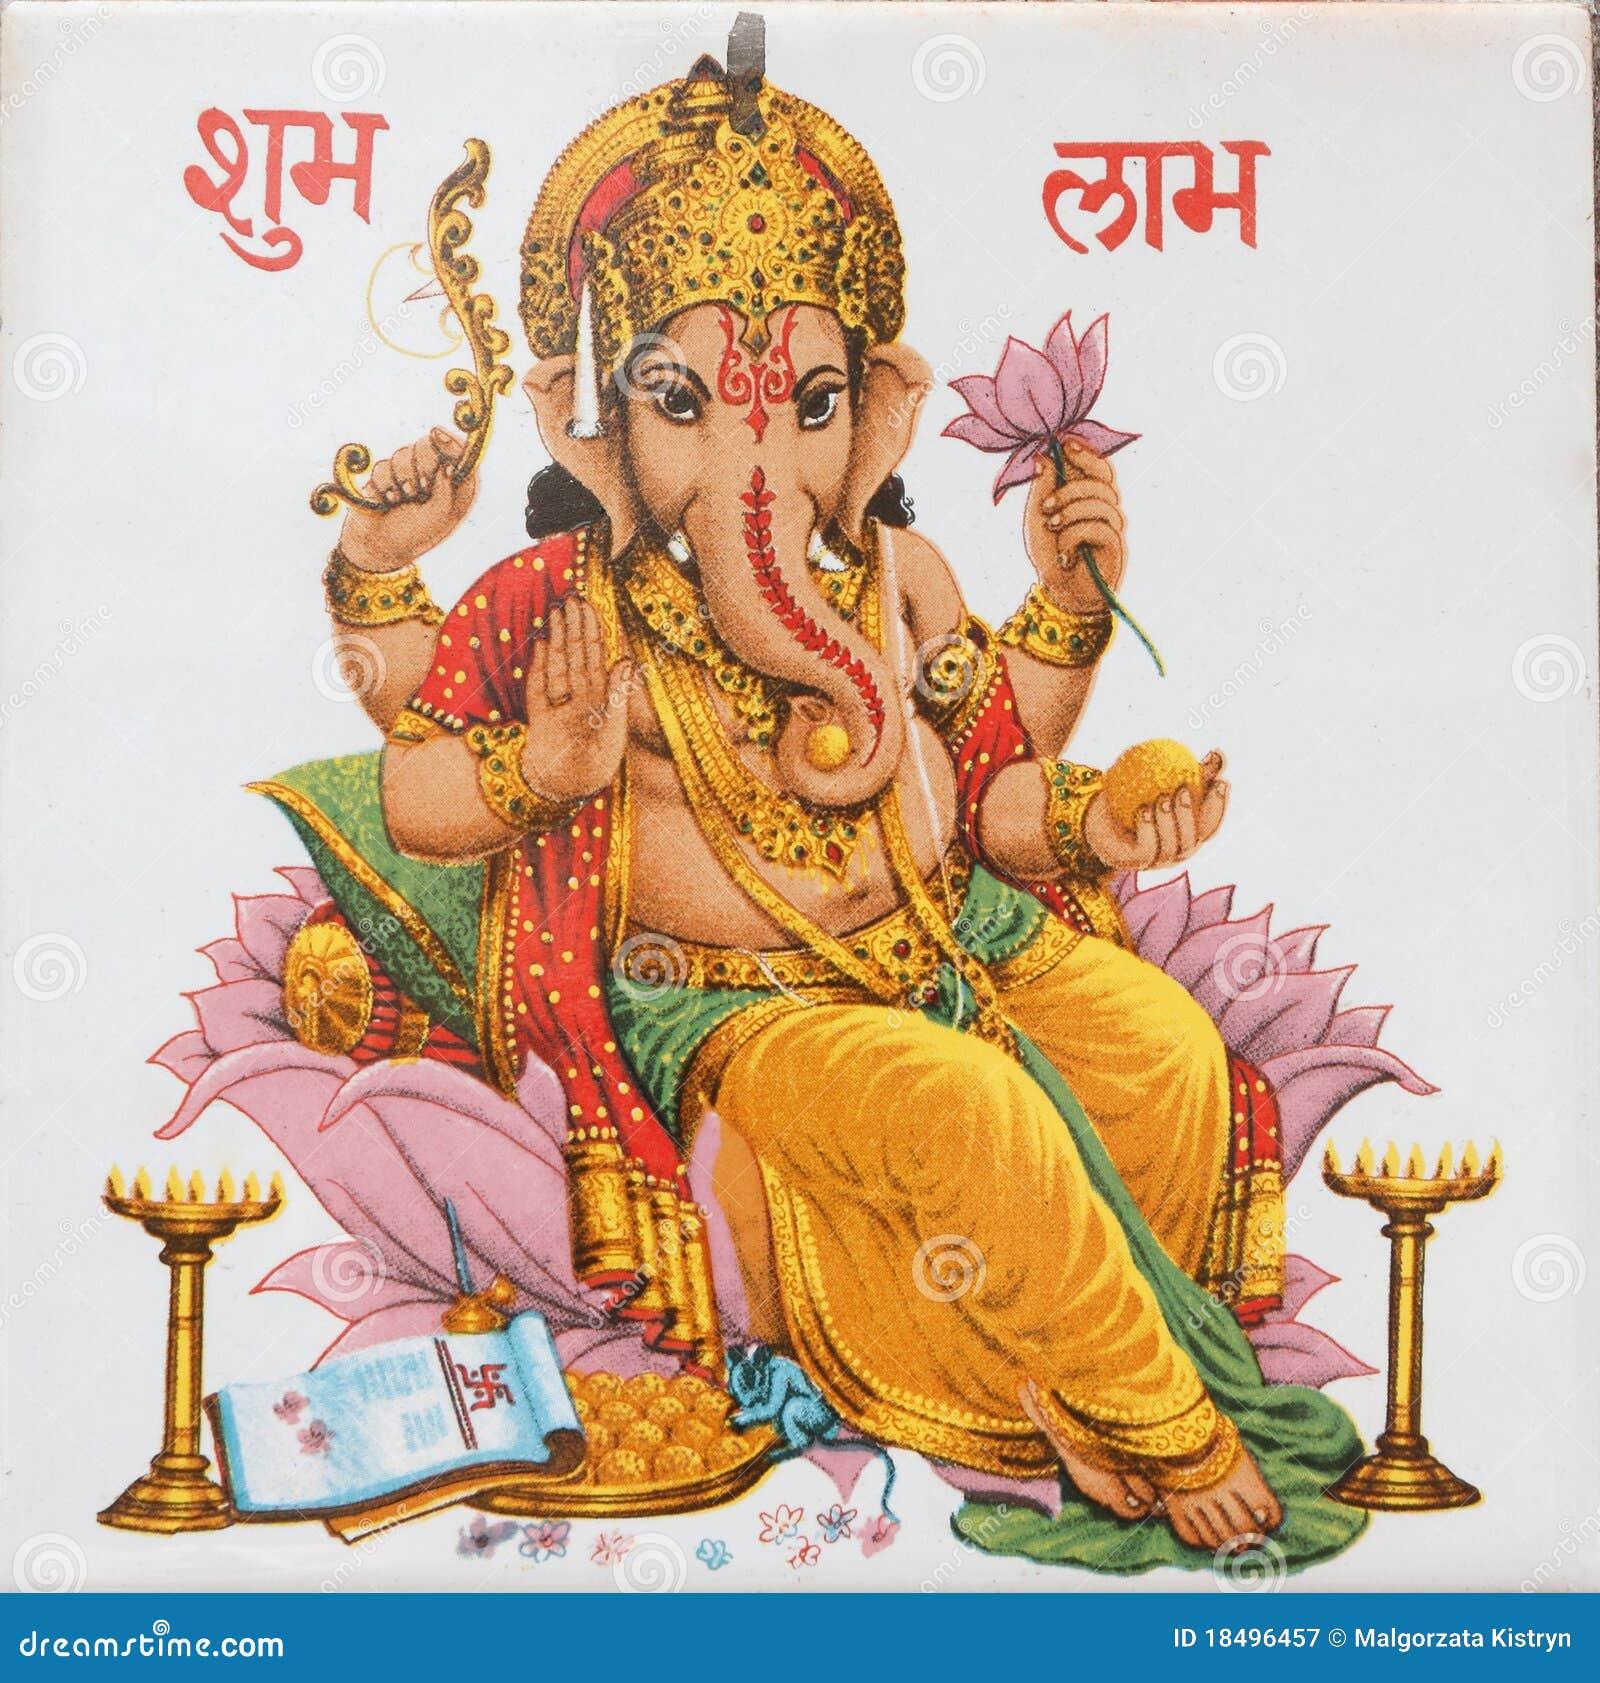 Ganesha sitting on lotus flower india stock image image of bombay download ganesha sitting on lotus flower india stock image image of bombay illustration mightylinksfo